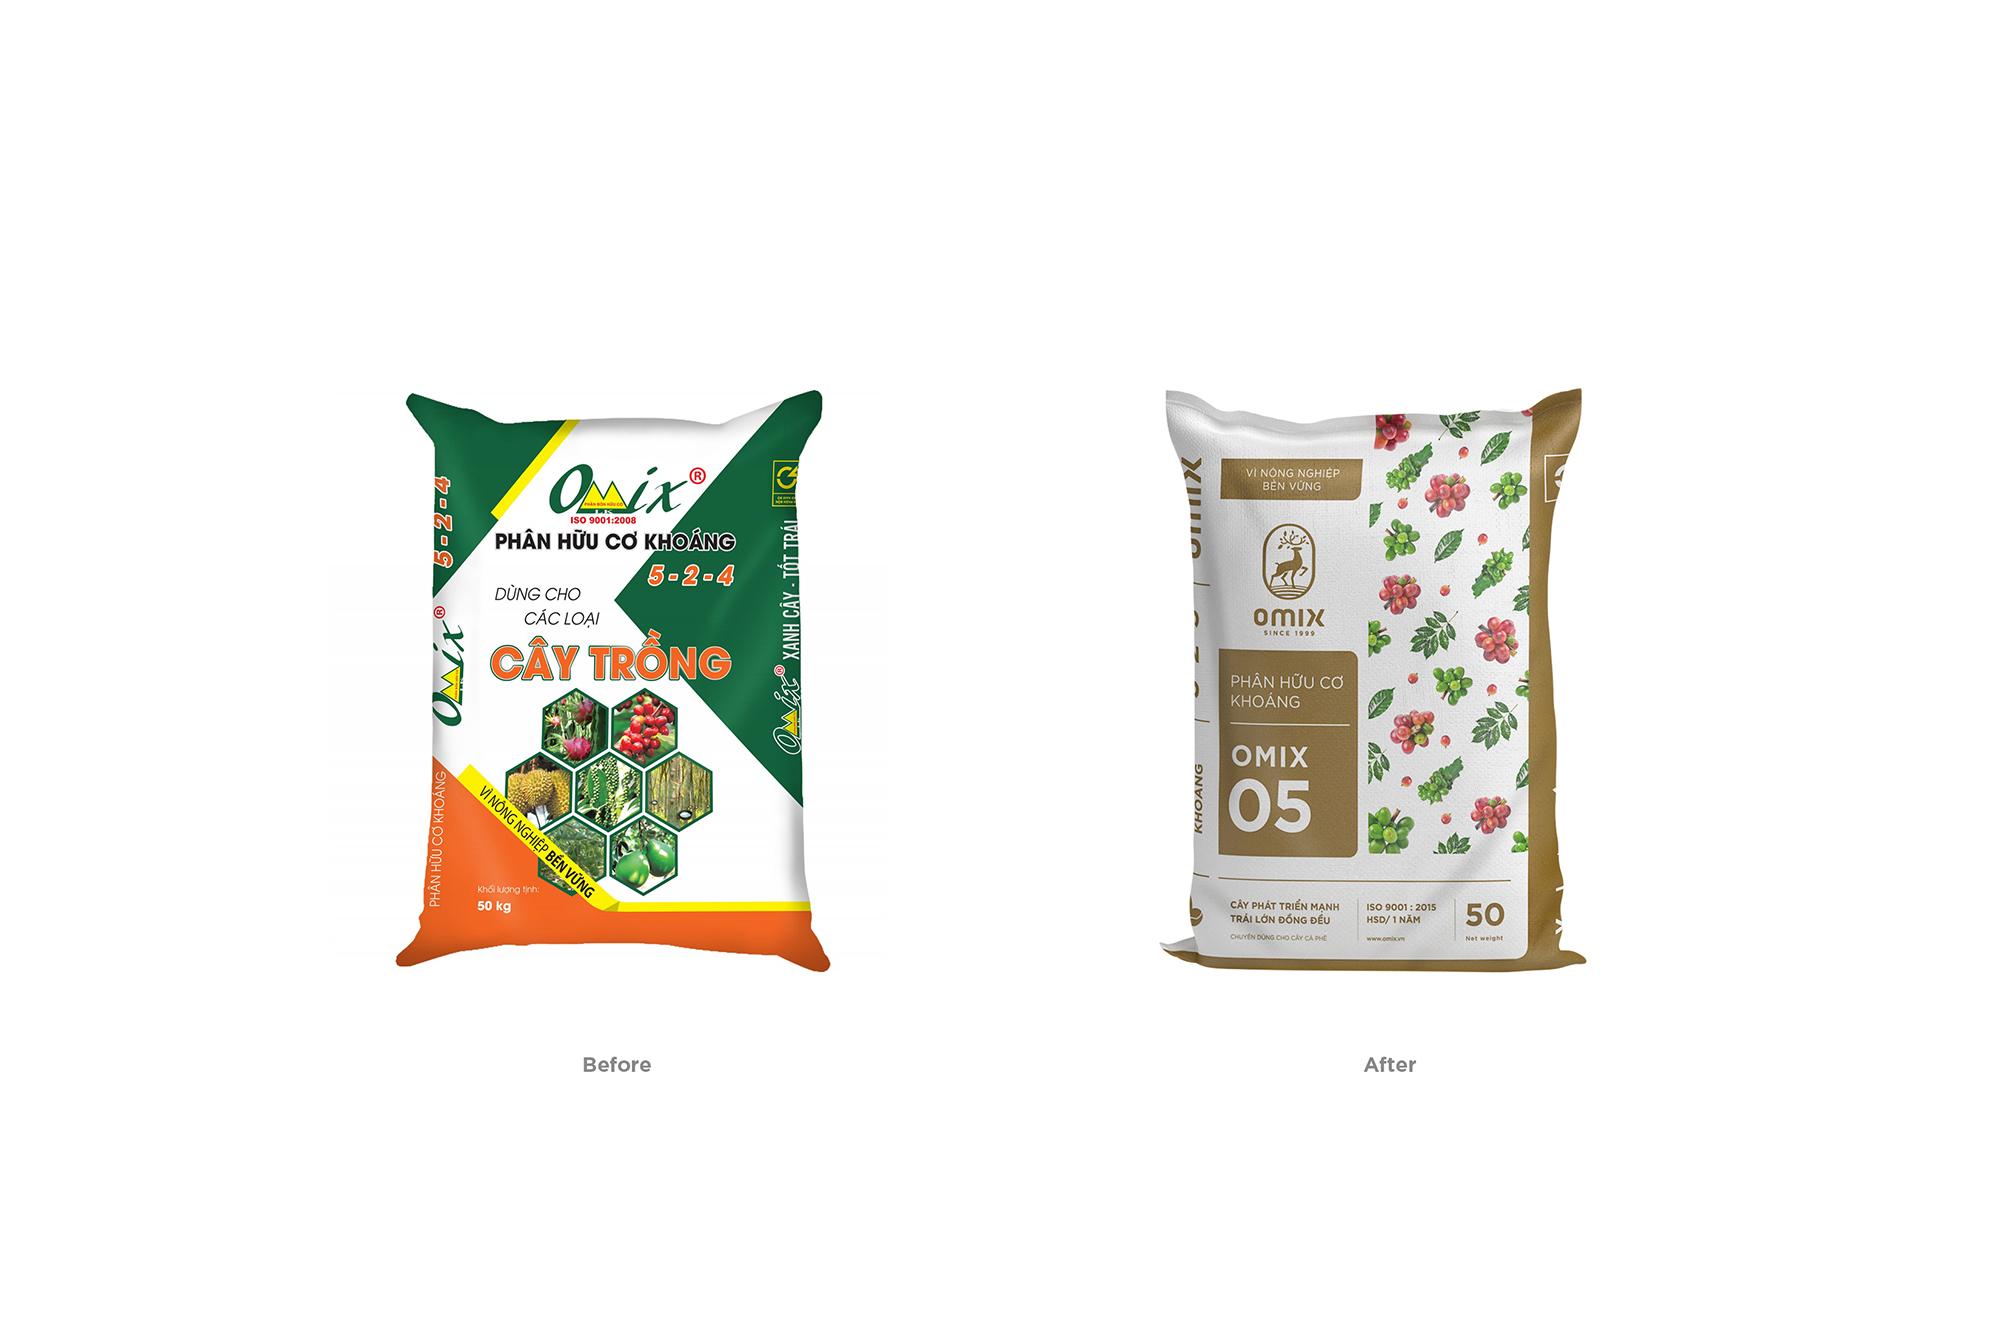 rgb_creative_ideas_design_packaging_bratus_omix_016